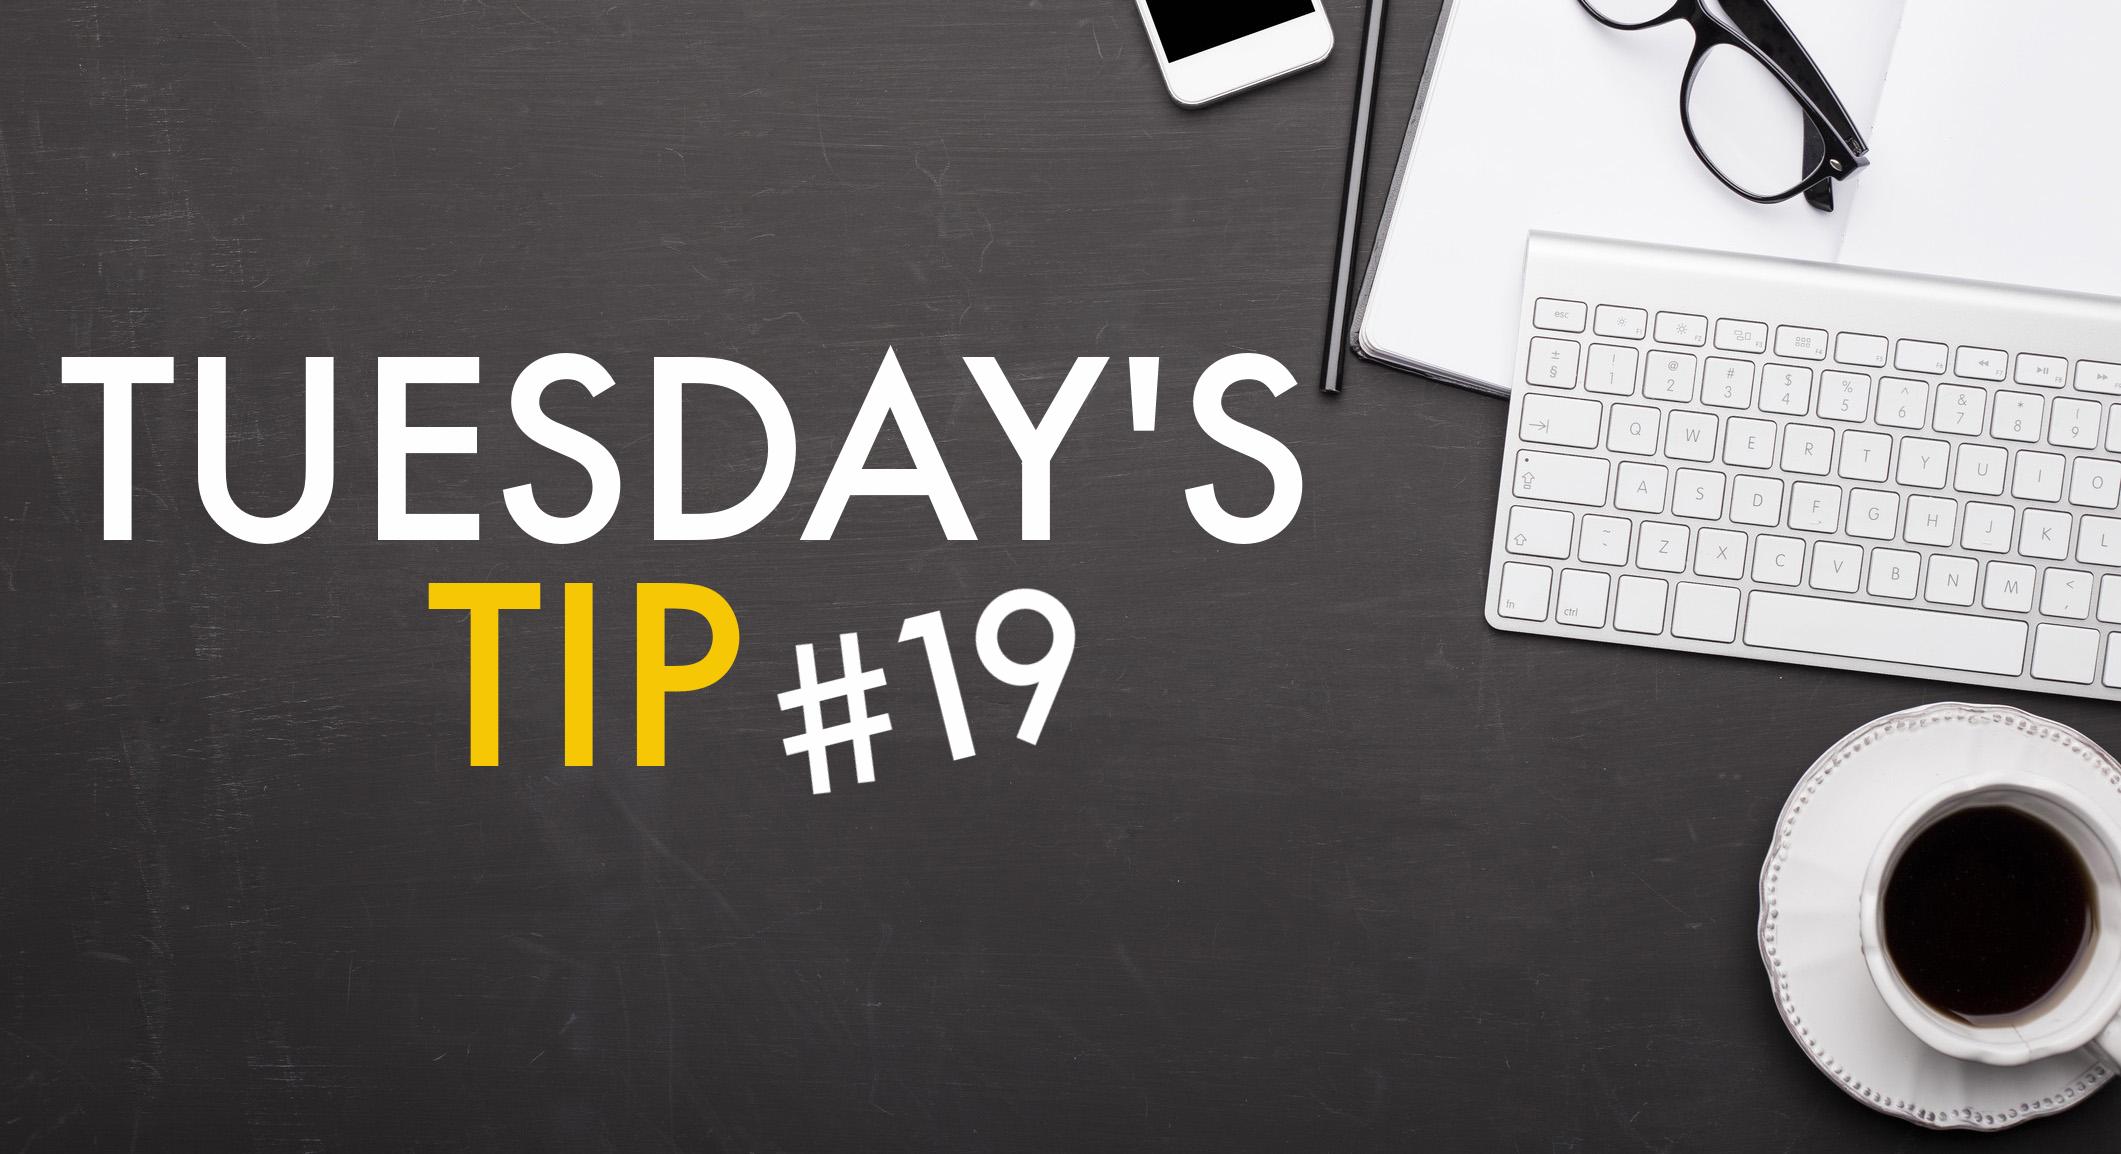 Tuesdays Tip 19